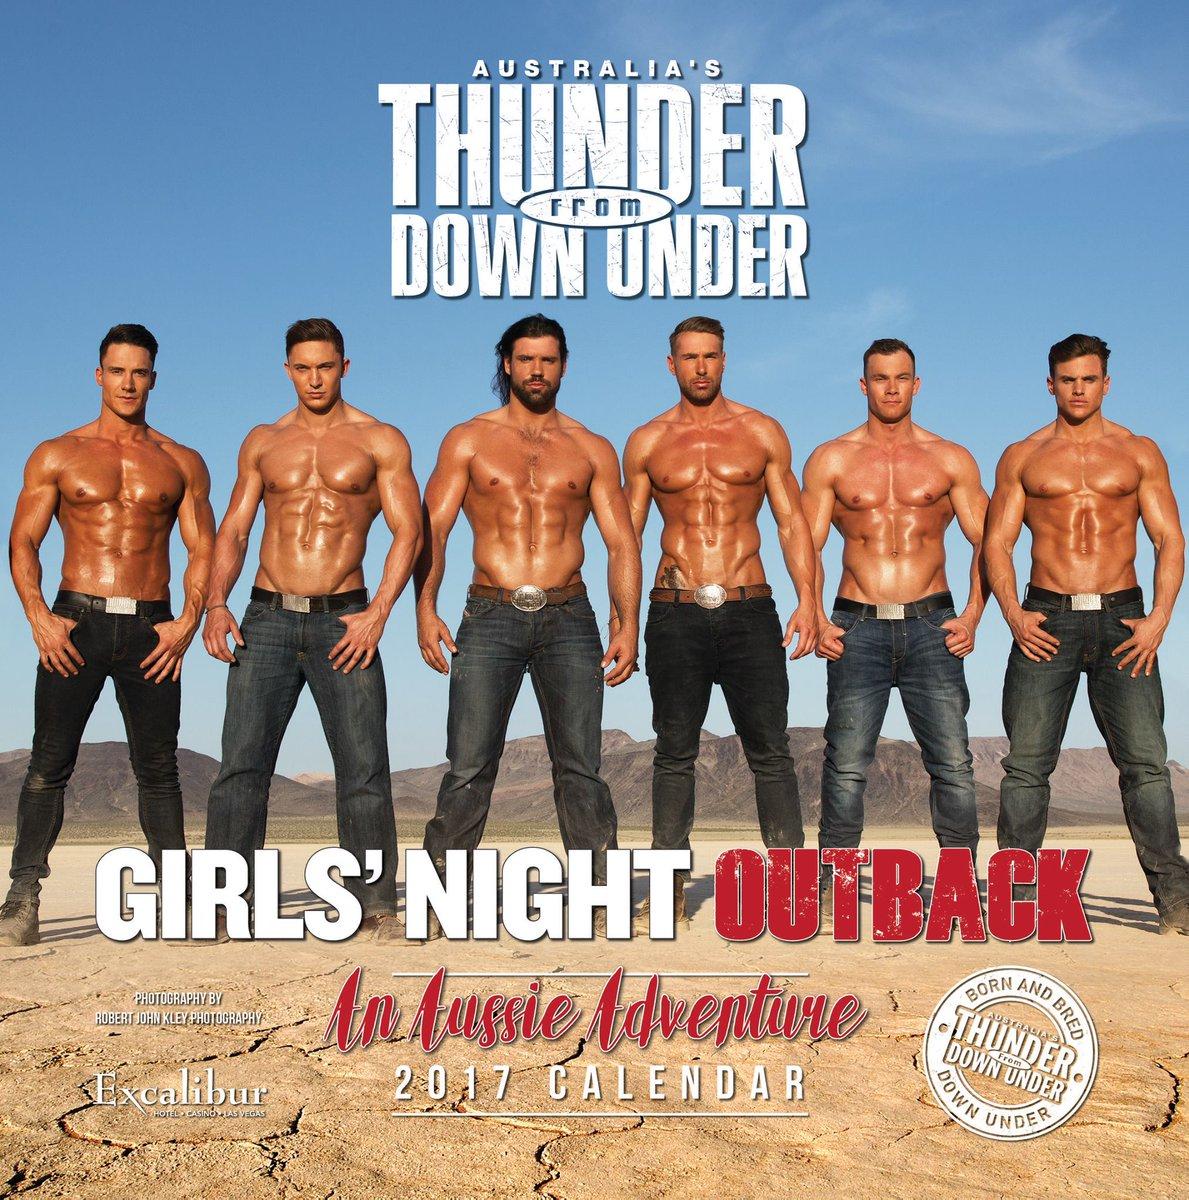 Australias Thunder From Down Under On Twitter Its Australias